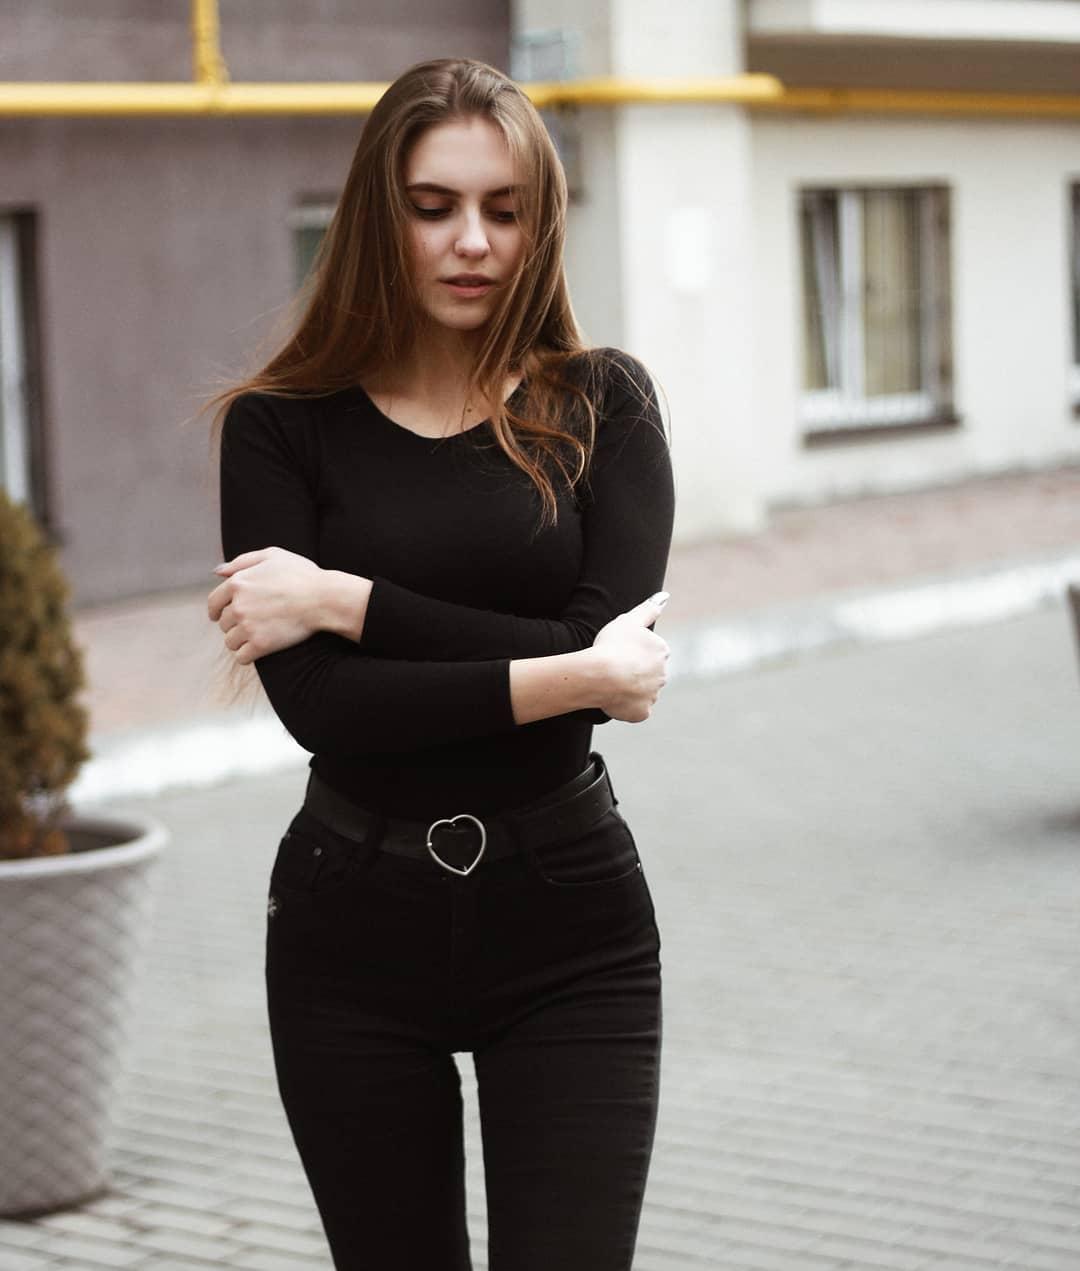 Katya-Melnyk-Wallpapers-Insta-Biography-4